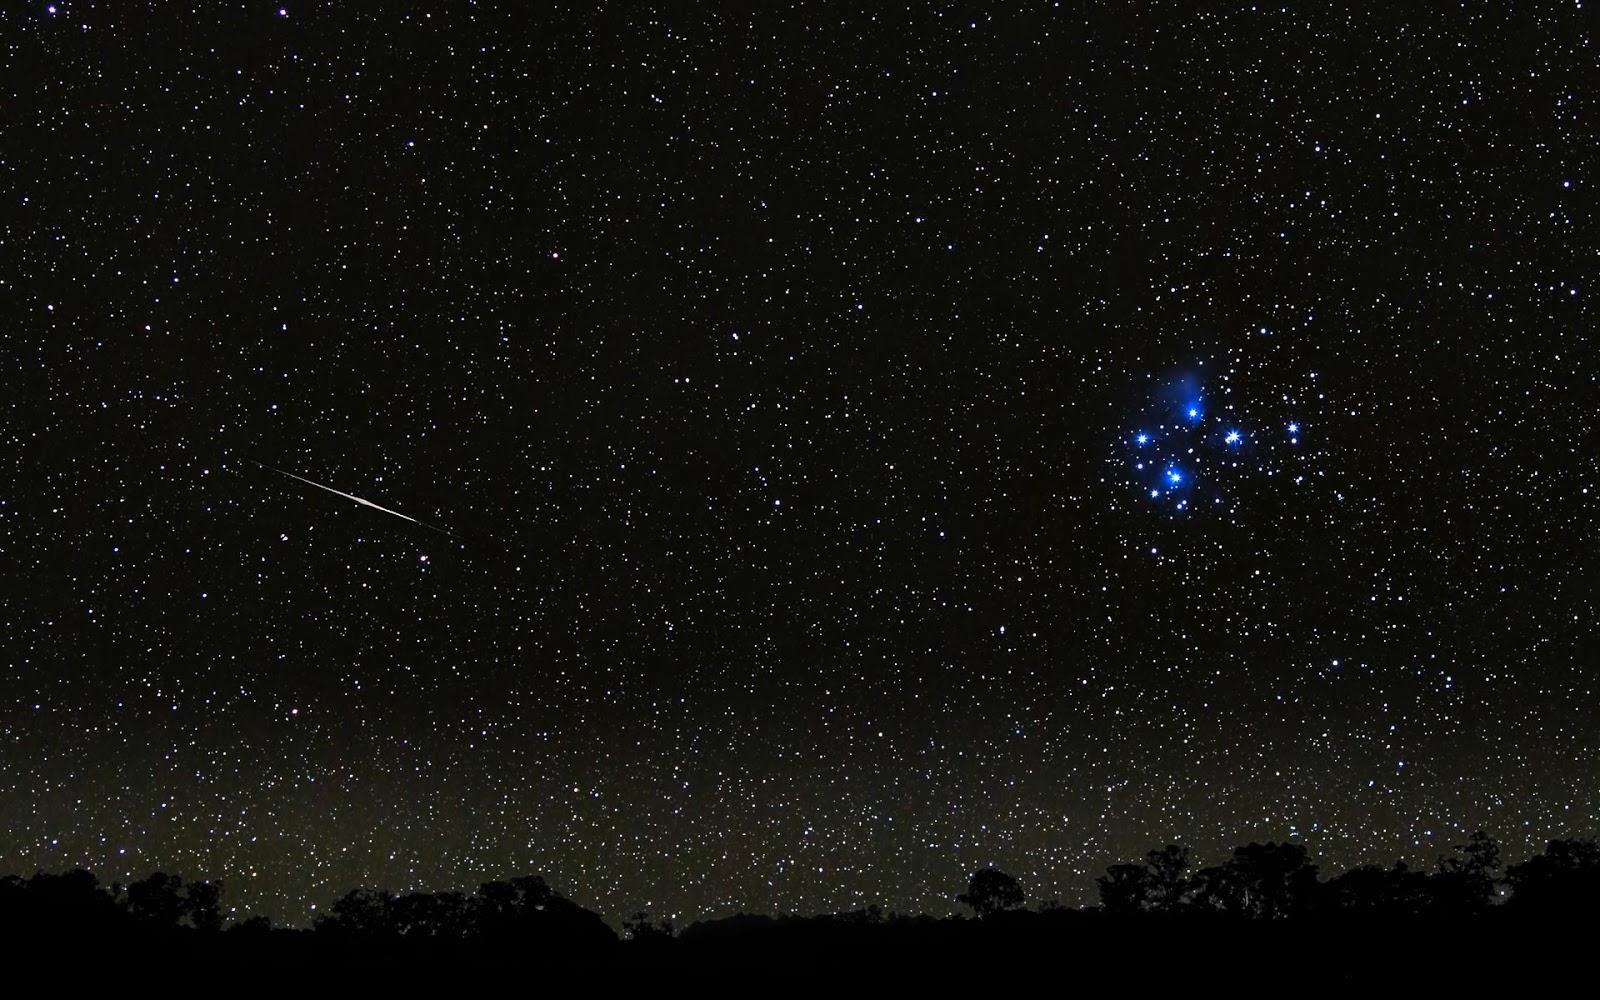 night sky stars wallpaper night sky stars wallpaper night sky stars 1600x1000